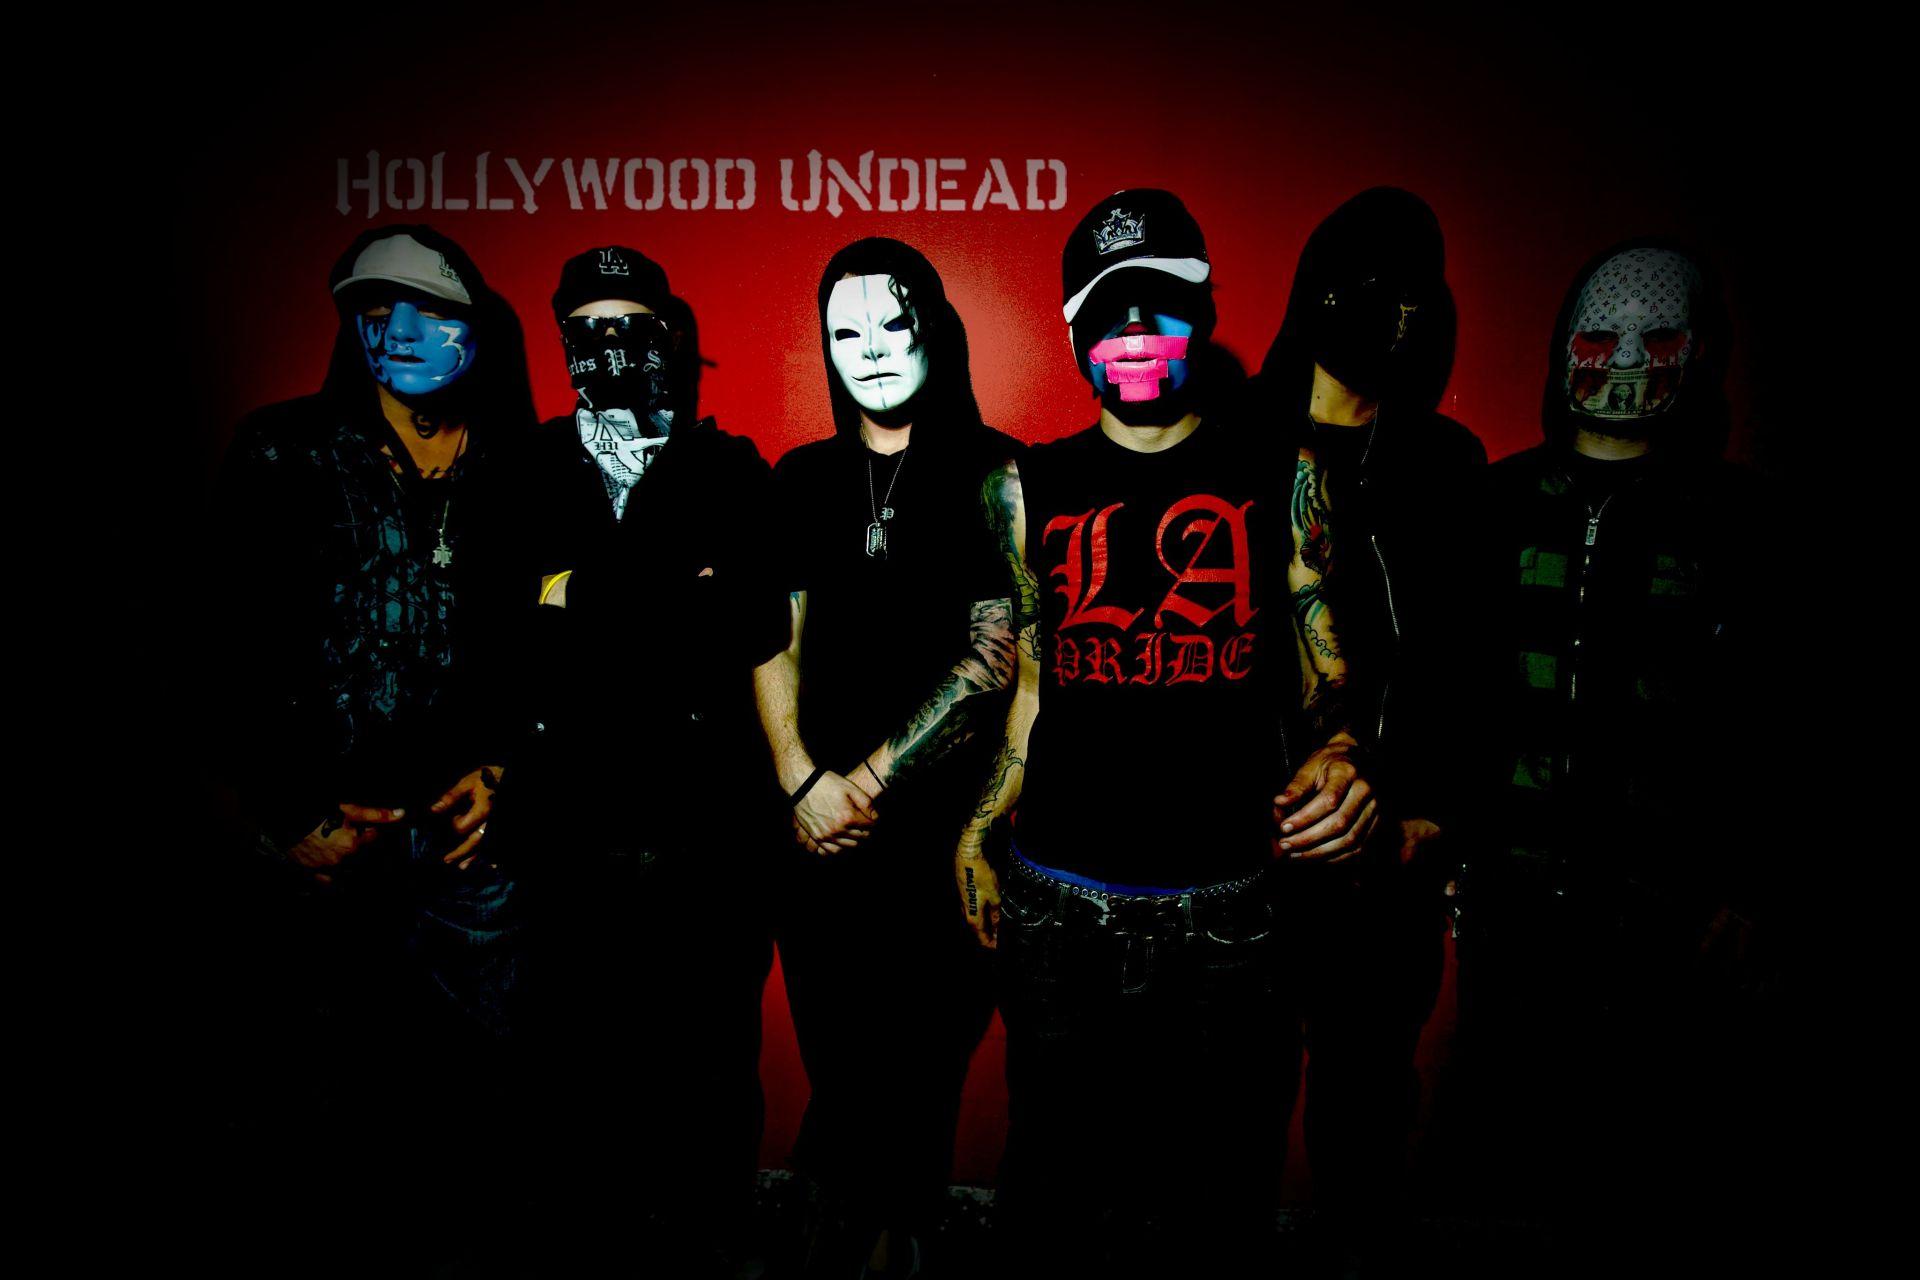 Картинки Hollywood Undead